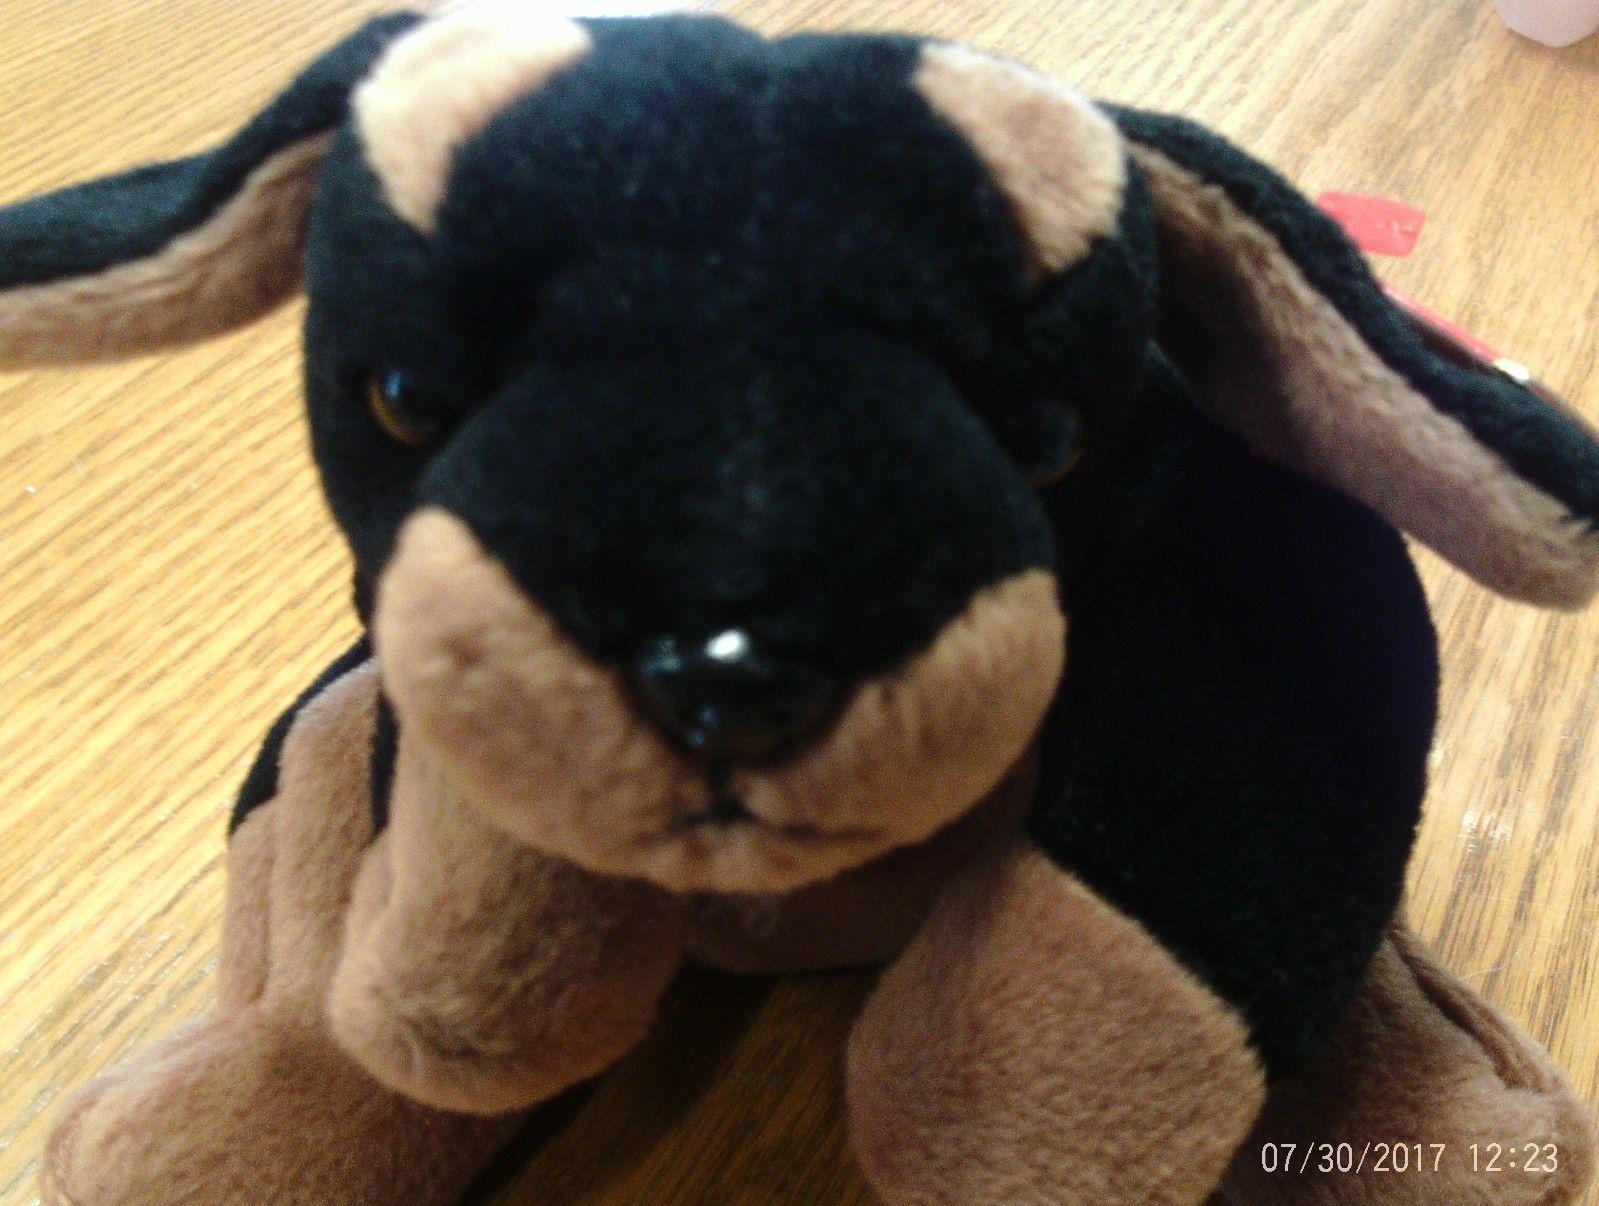 7cfe5c82b6b 1st Edition Ty Beanie Babies Doby the Dog- Ty Beanie Babies